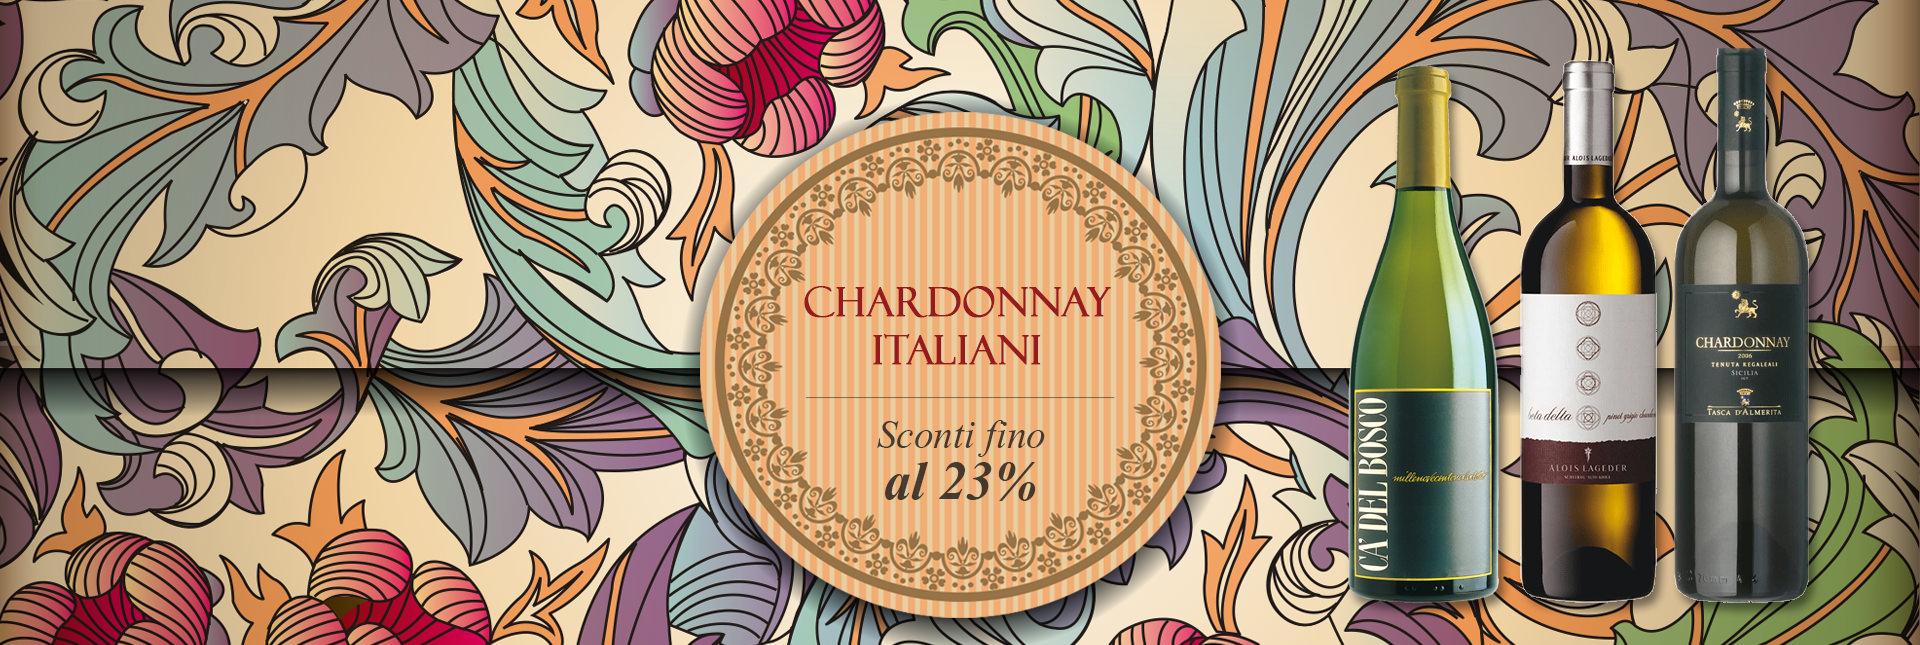 Vini Chardonnay